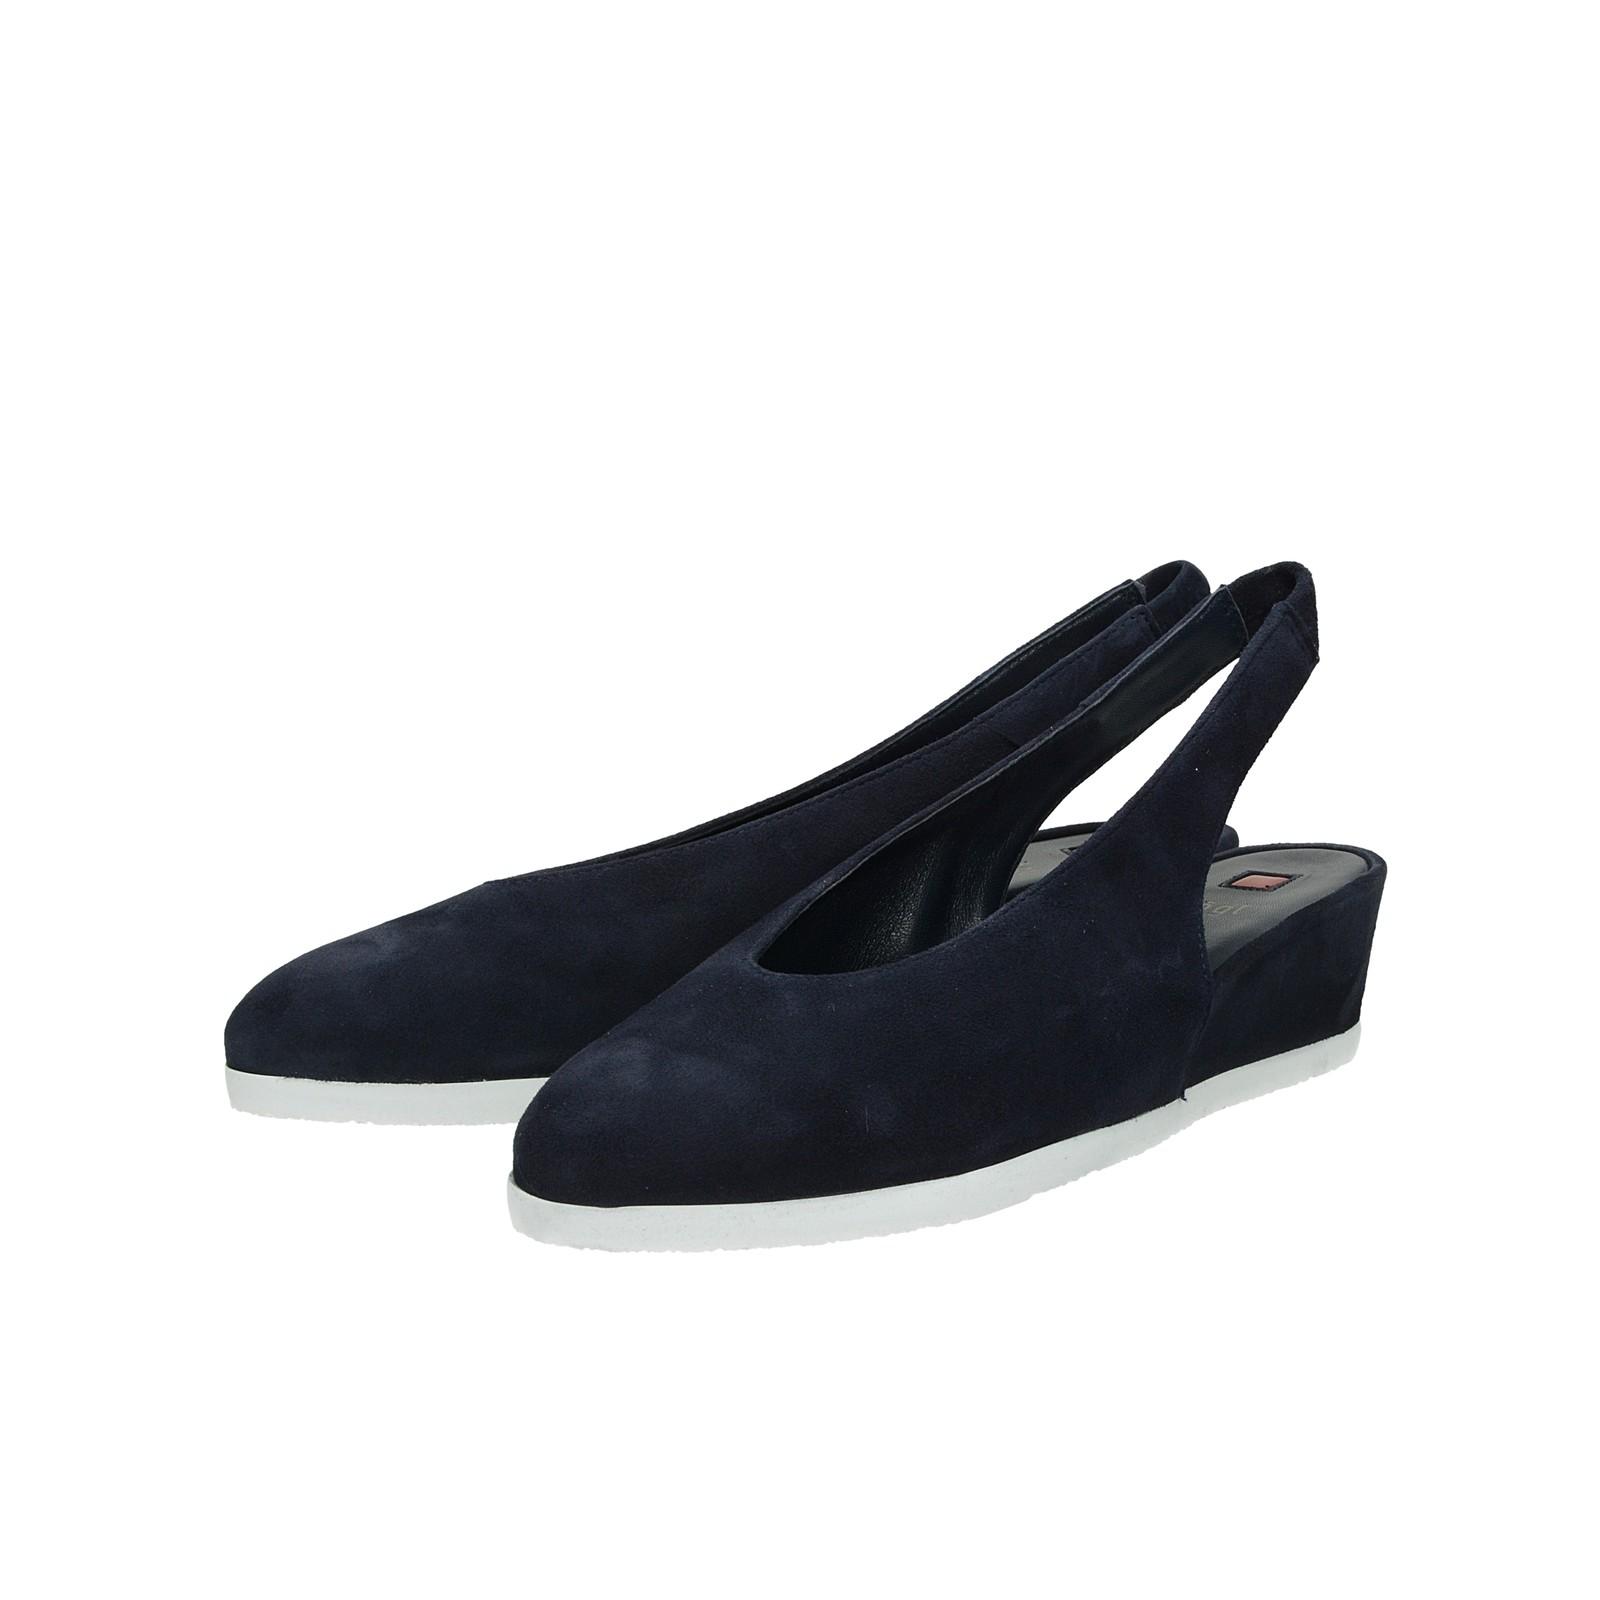 deae71d161 ... Högl dámske semišové sandále - tmavomodré ...